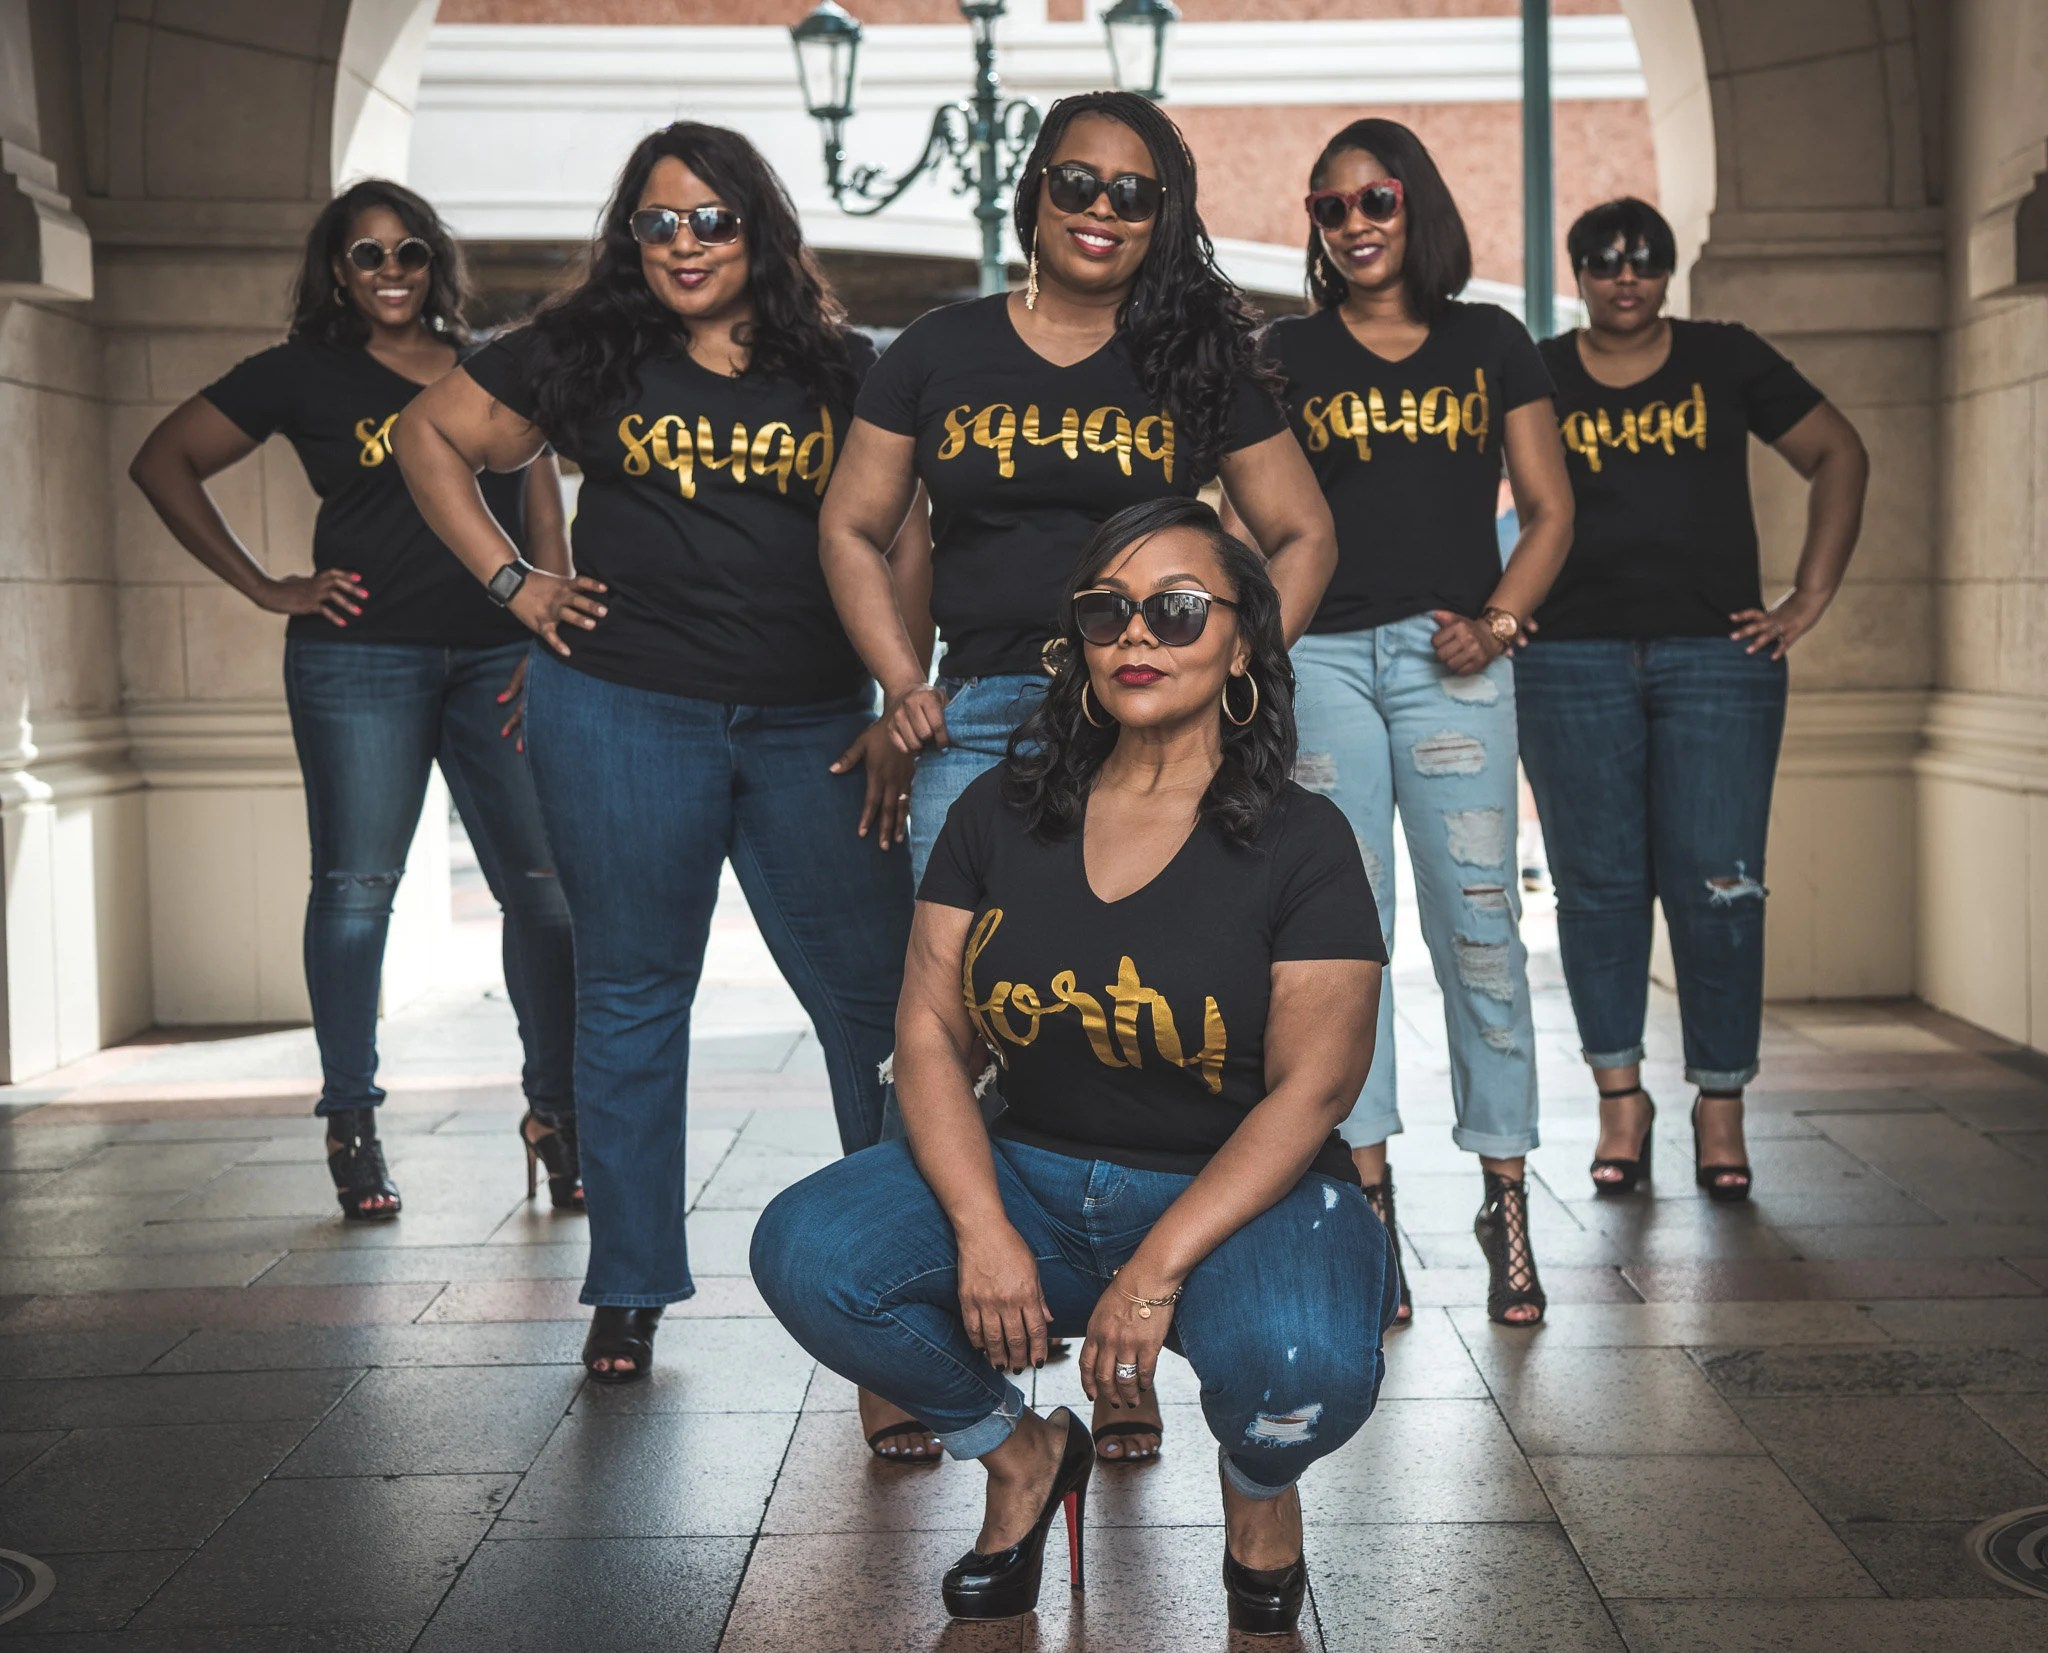 Birthday Squad Shirts For Women Birthday Queen Shirt 40th Birthday Shirt Women 40 Birthday For Women 40th Birthday Gifts For Women